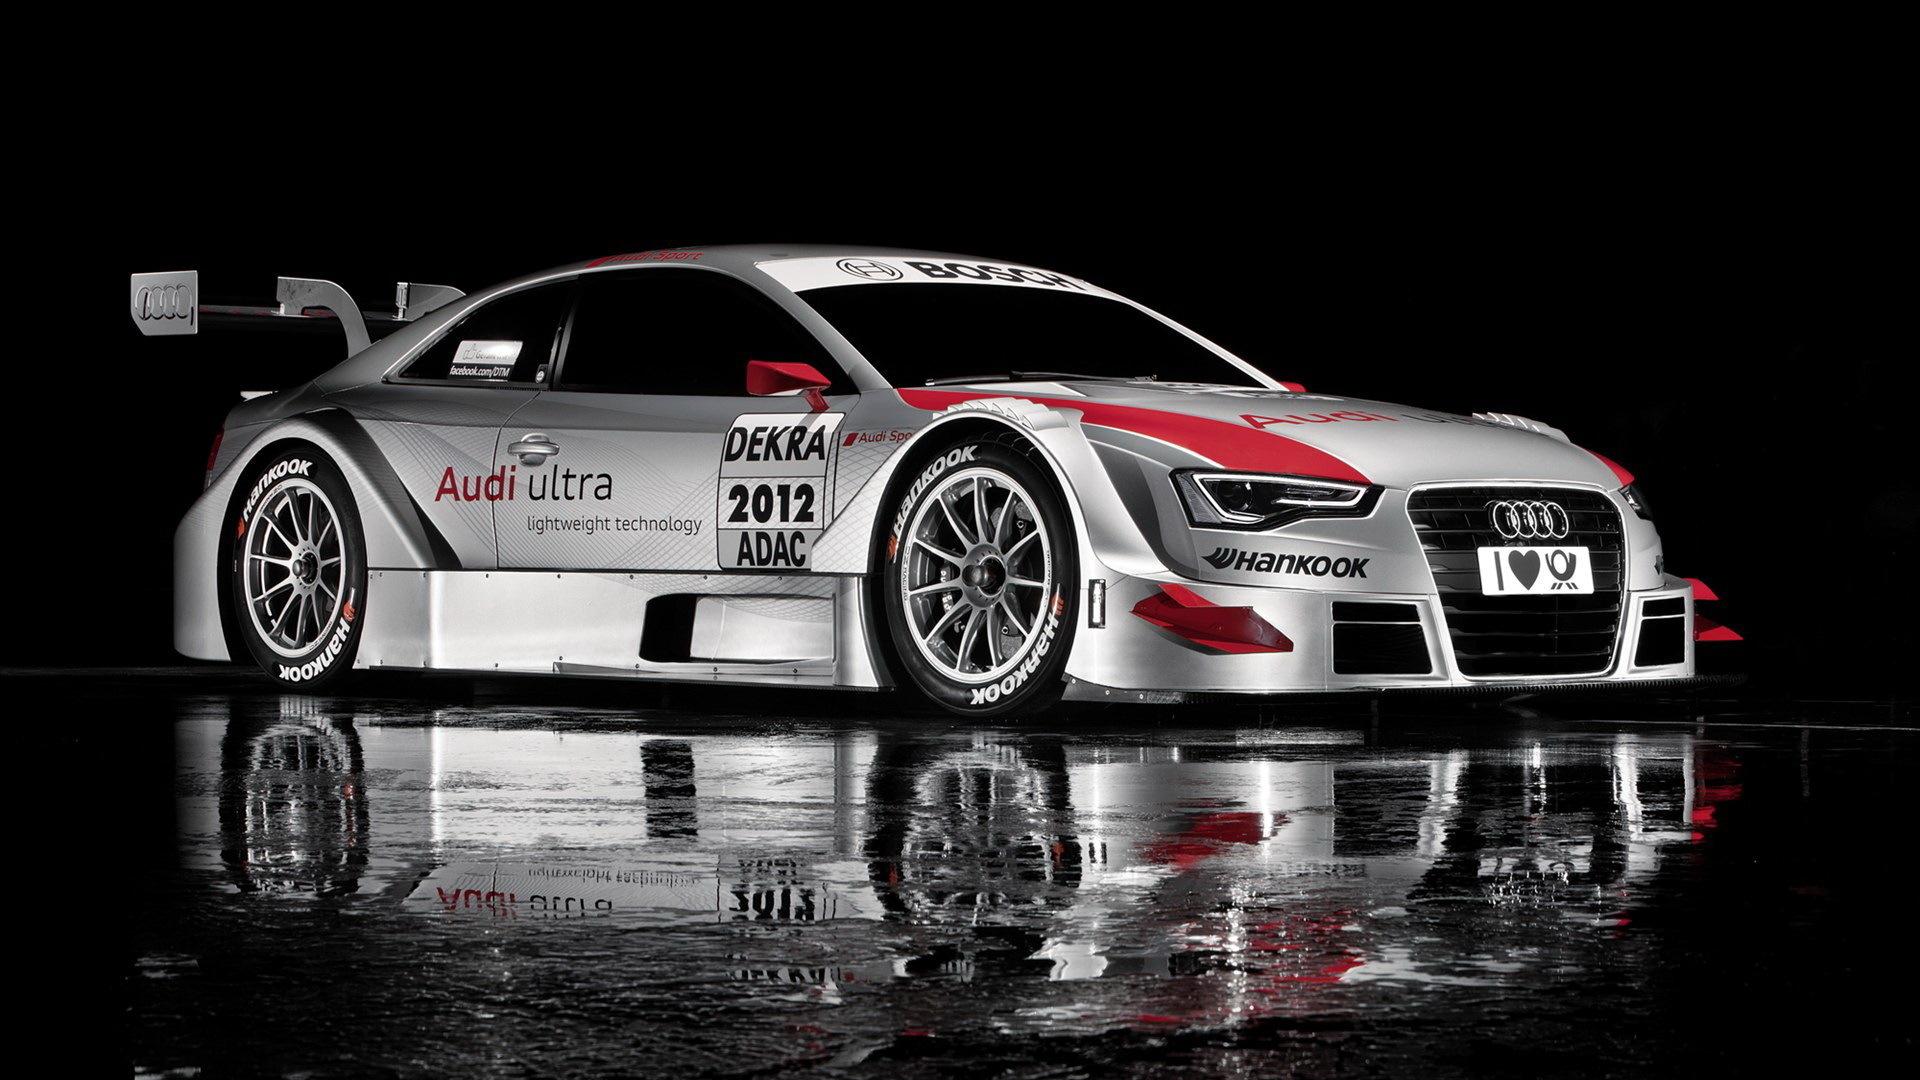 Audi Fond D Ecran Hd Arriere Plan 1920x1080 Id 194046 Wallpaper Abyss